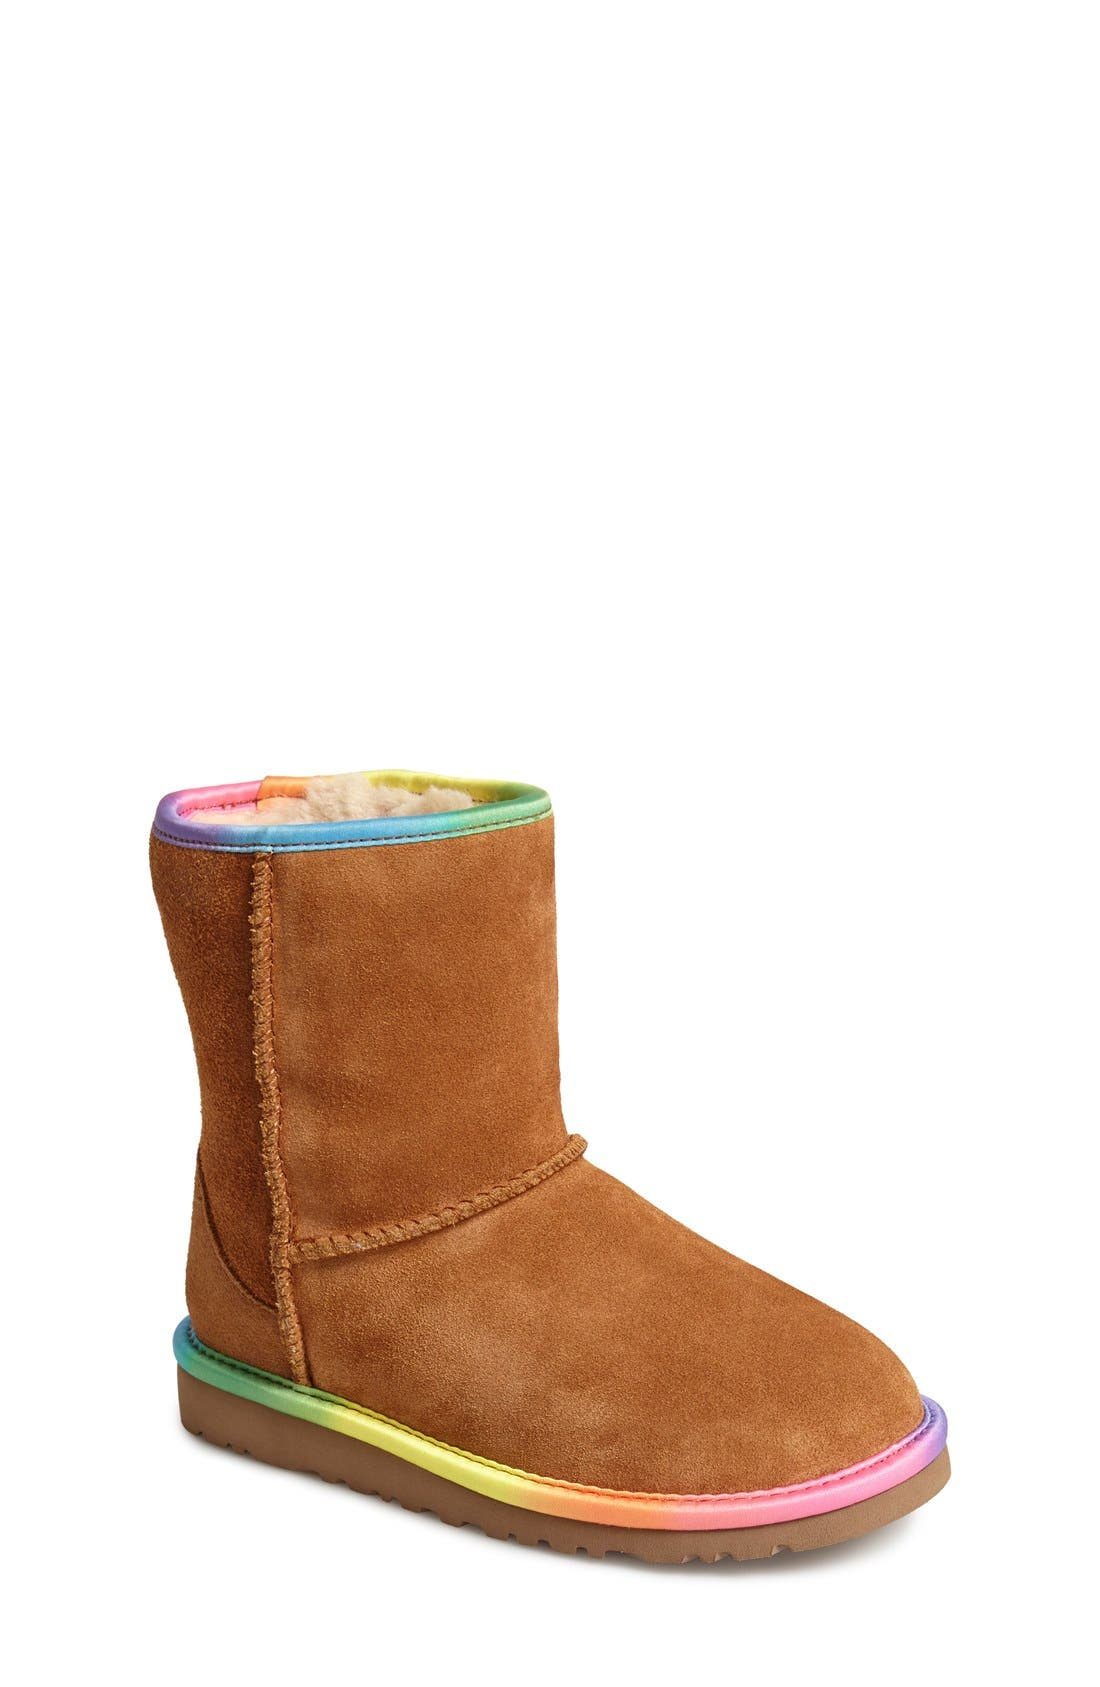 Australia 'Classic Short' Rainbow Boot, Main, color, 219